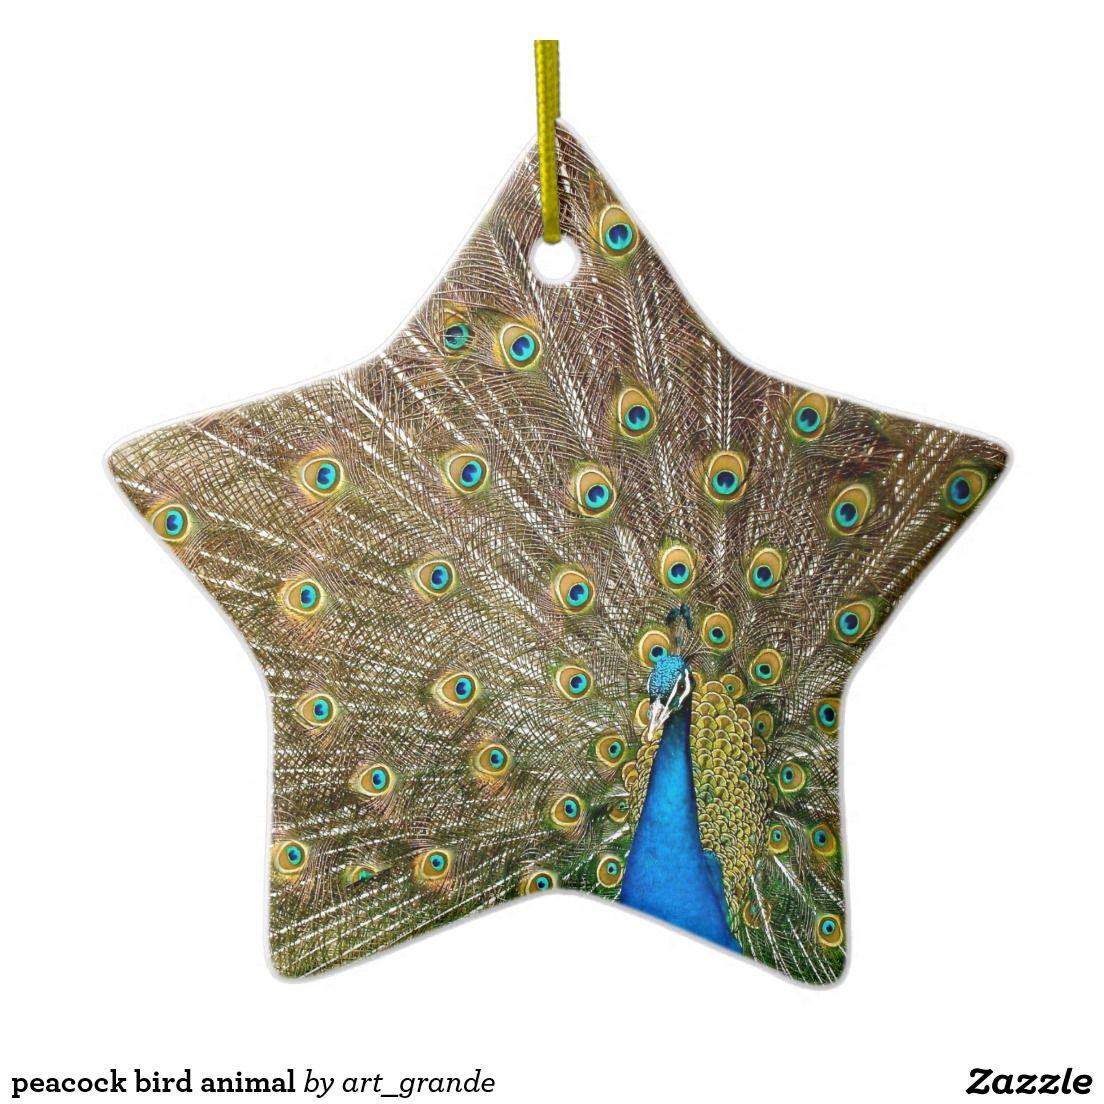 peacock bird animal ceramic ornament